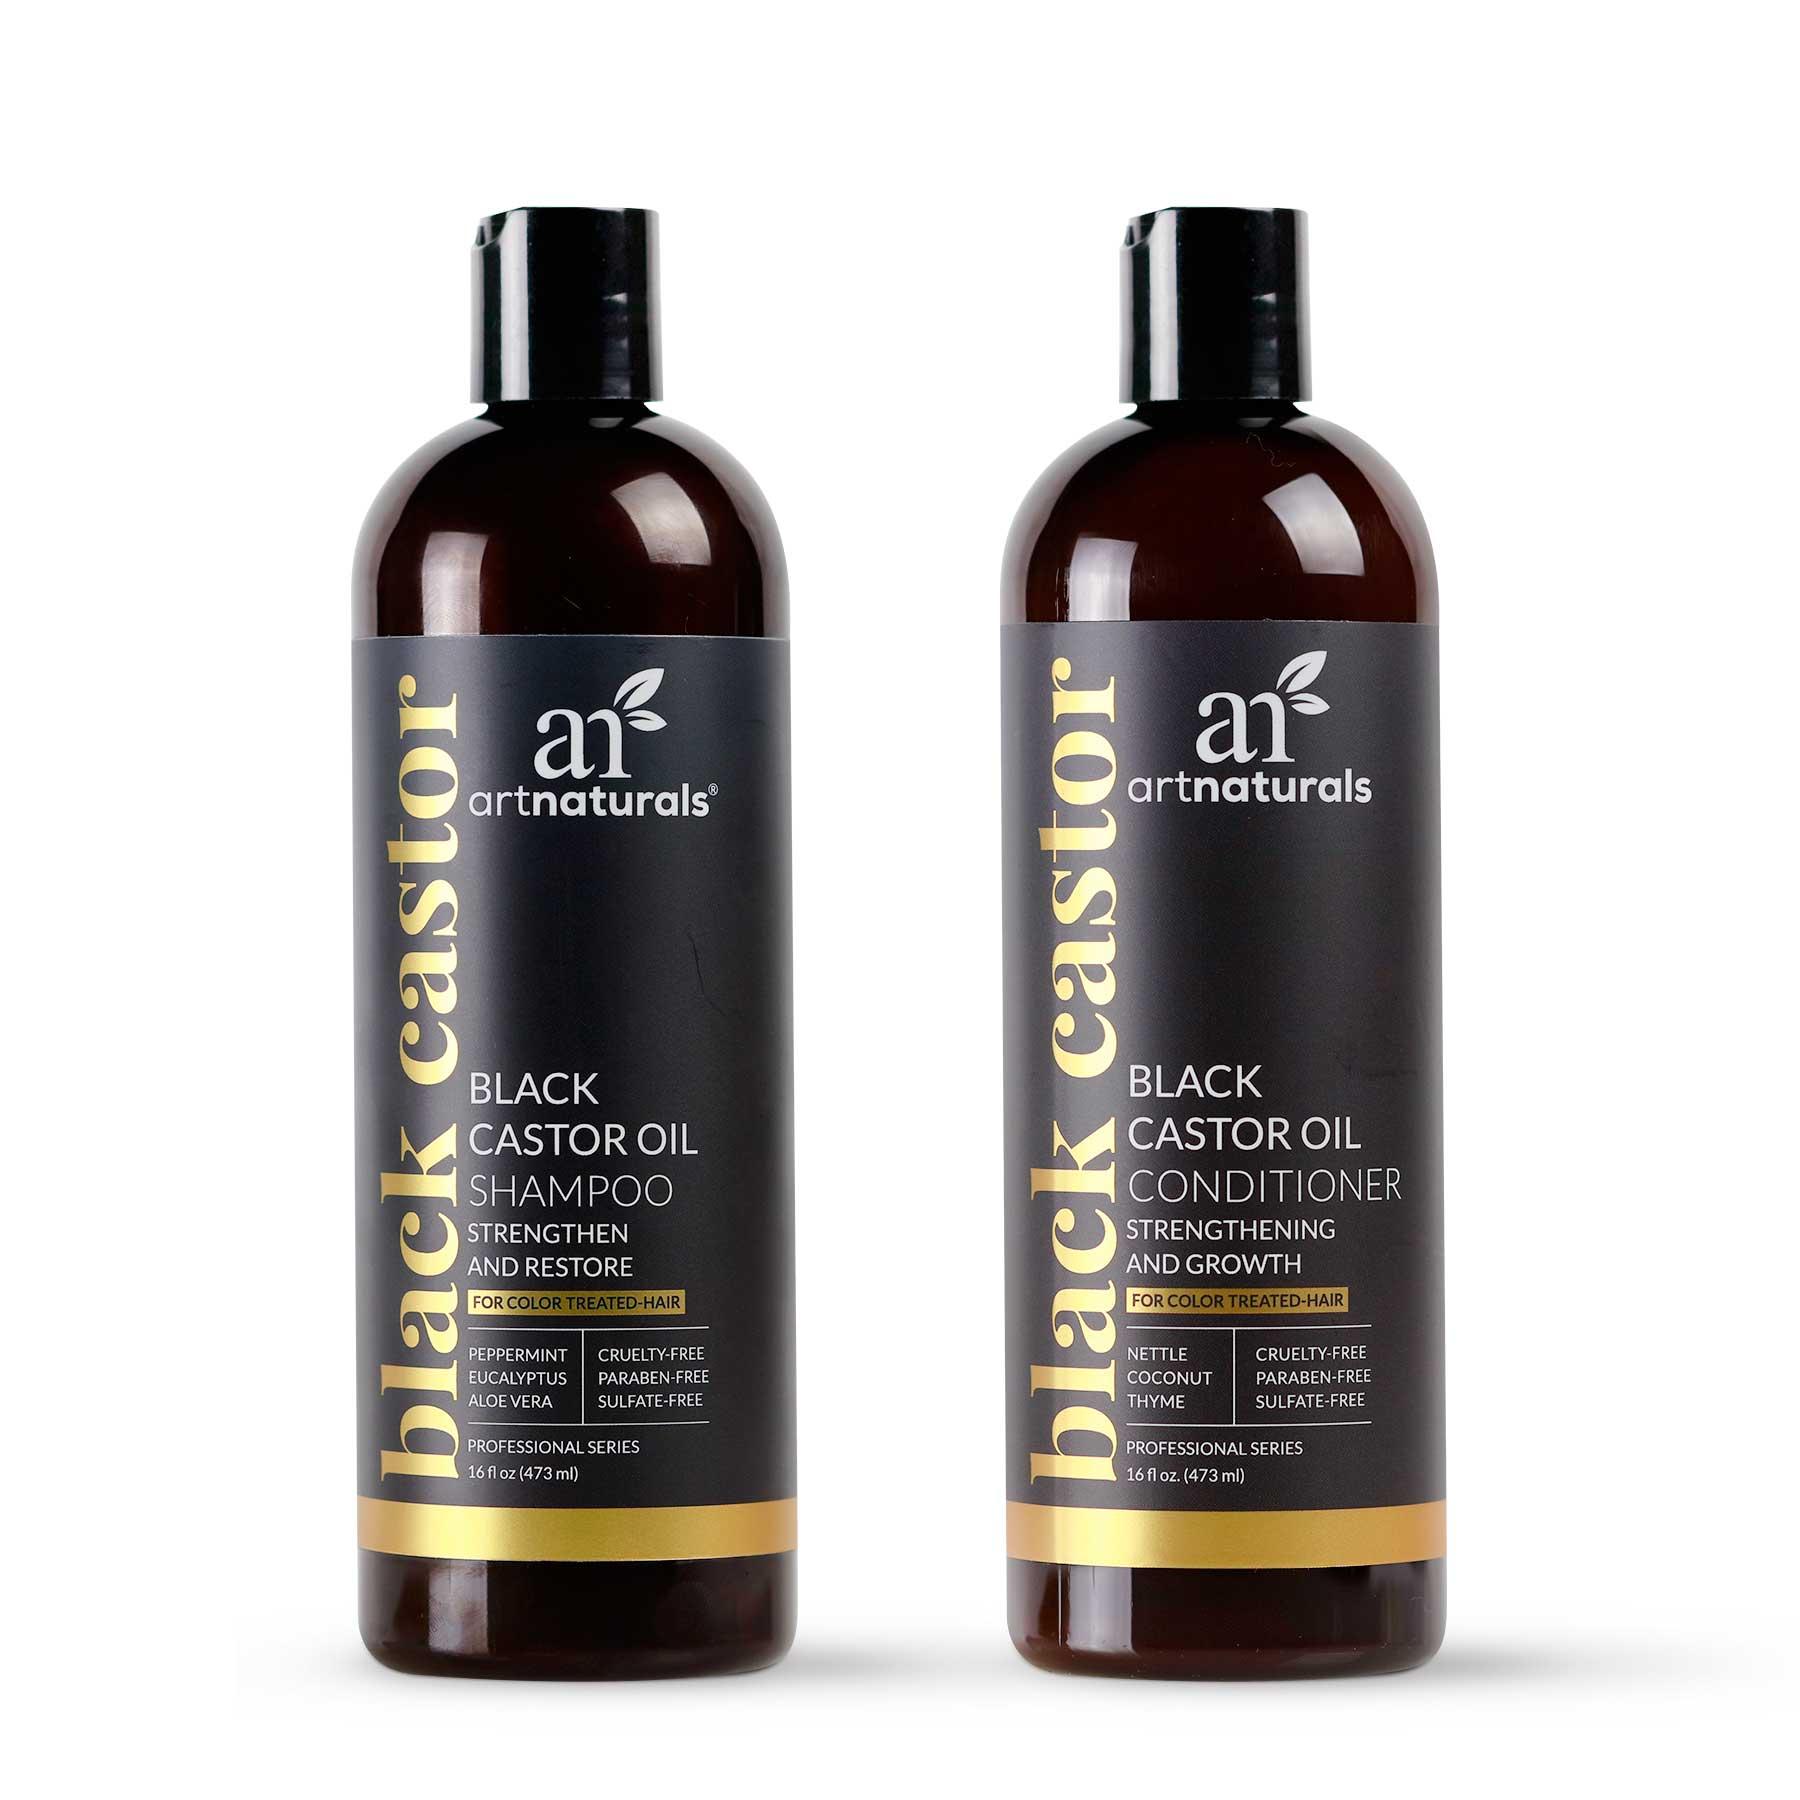 Black Castor Oil Shampoo & Conditioner